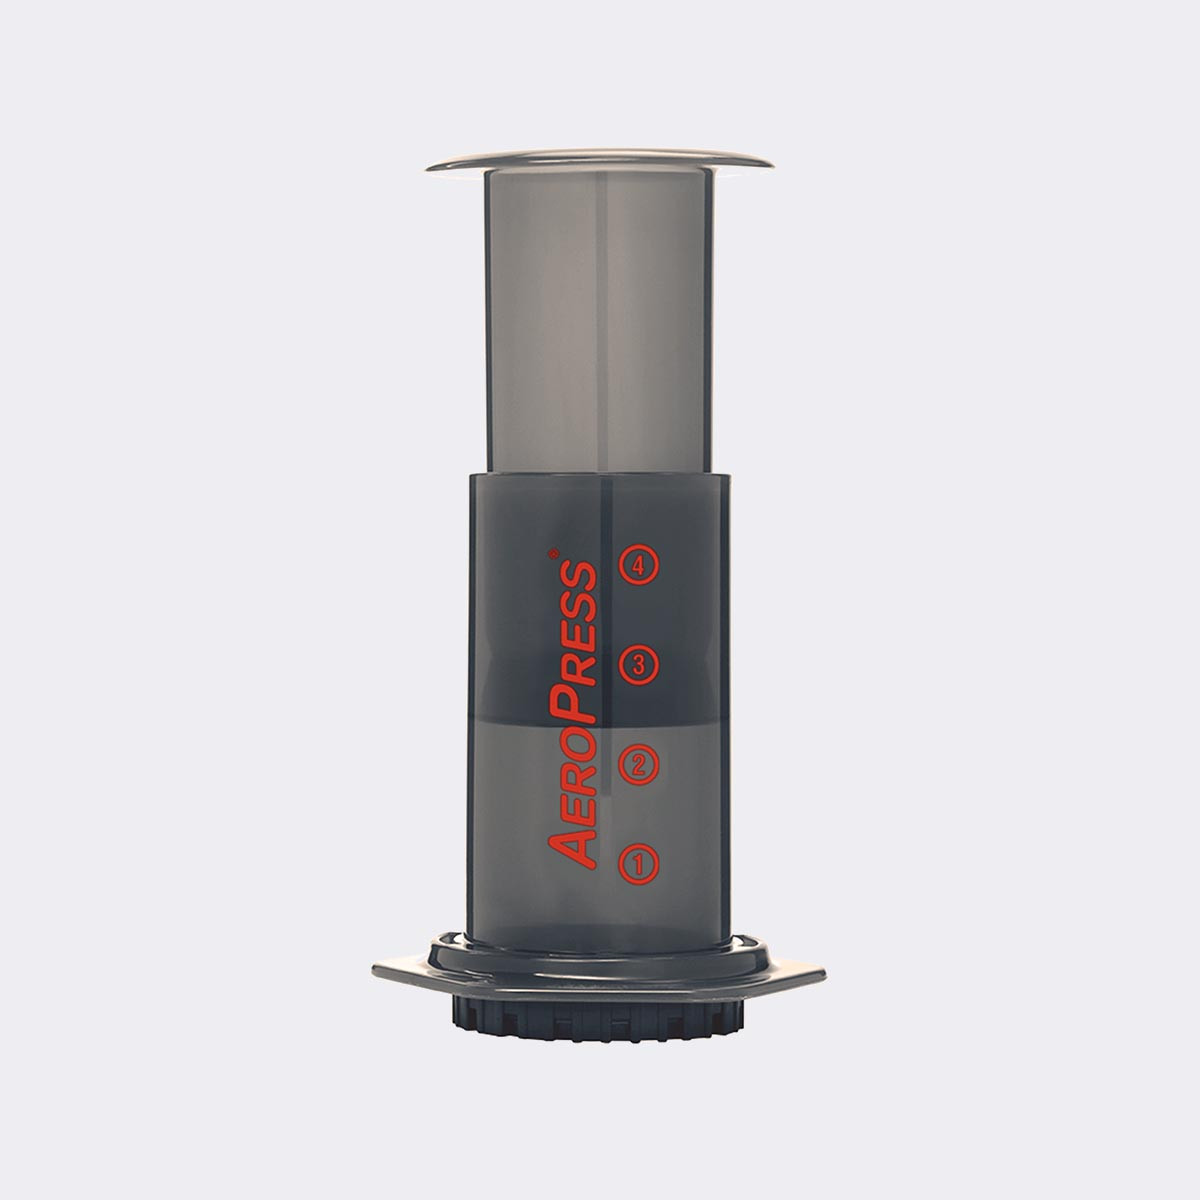 Ручная кофеварка Aeropress